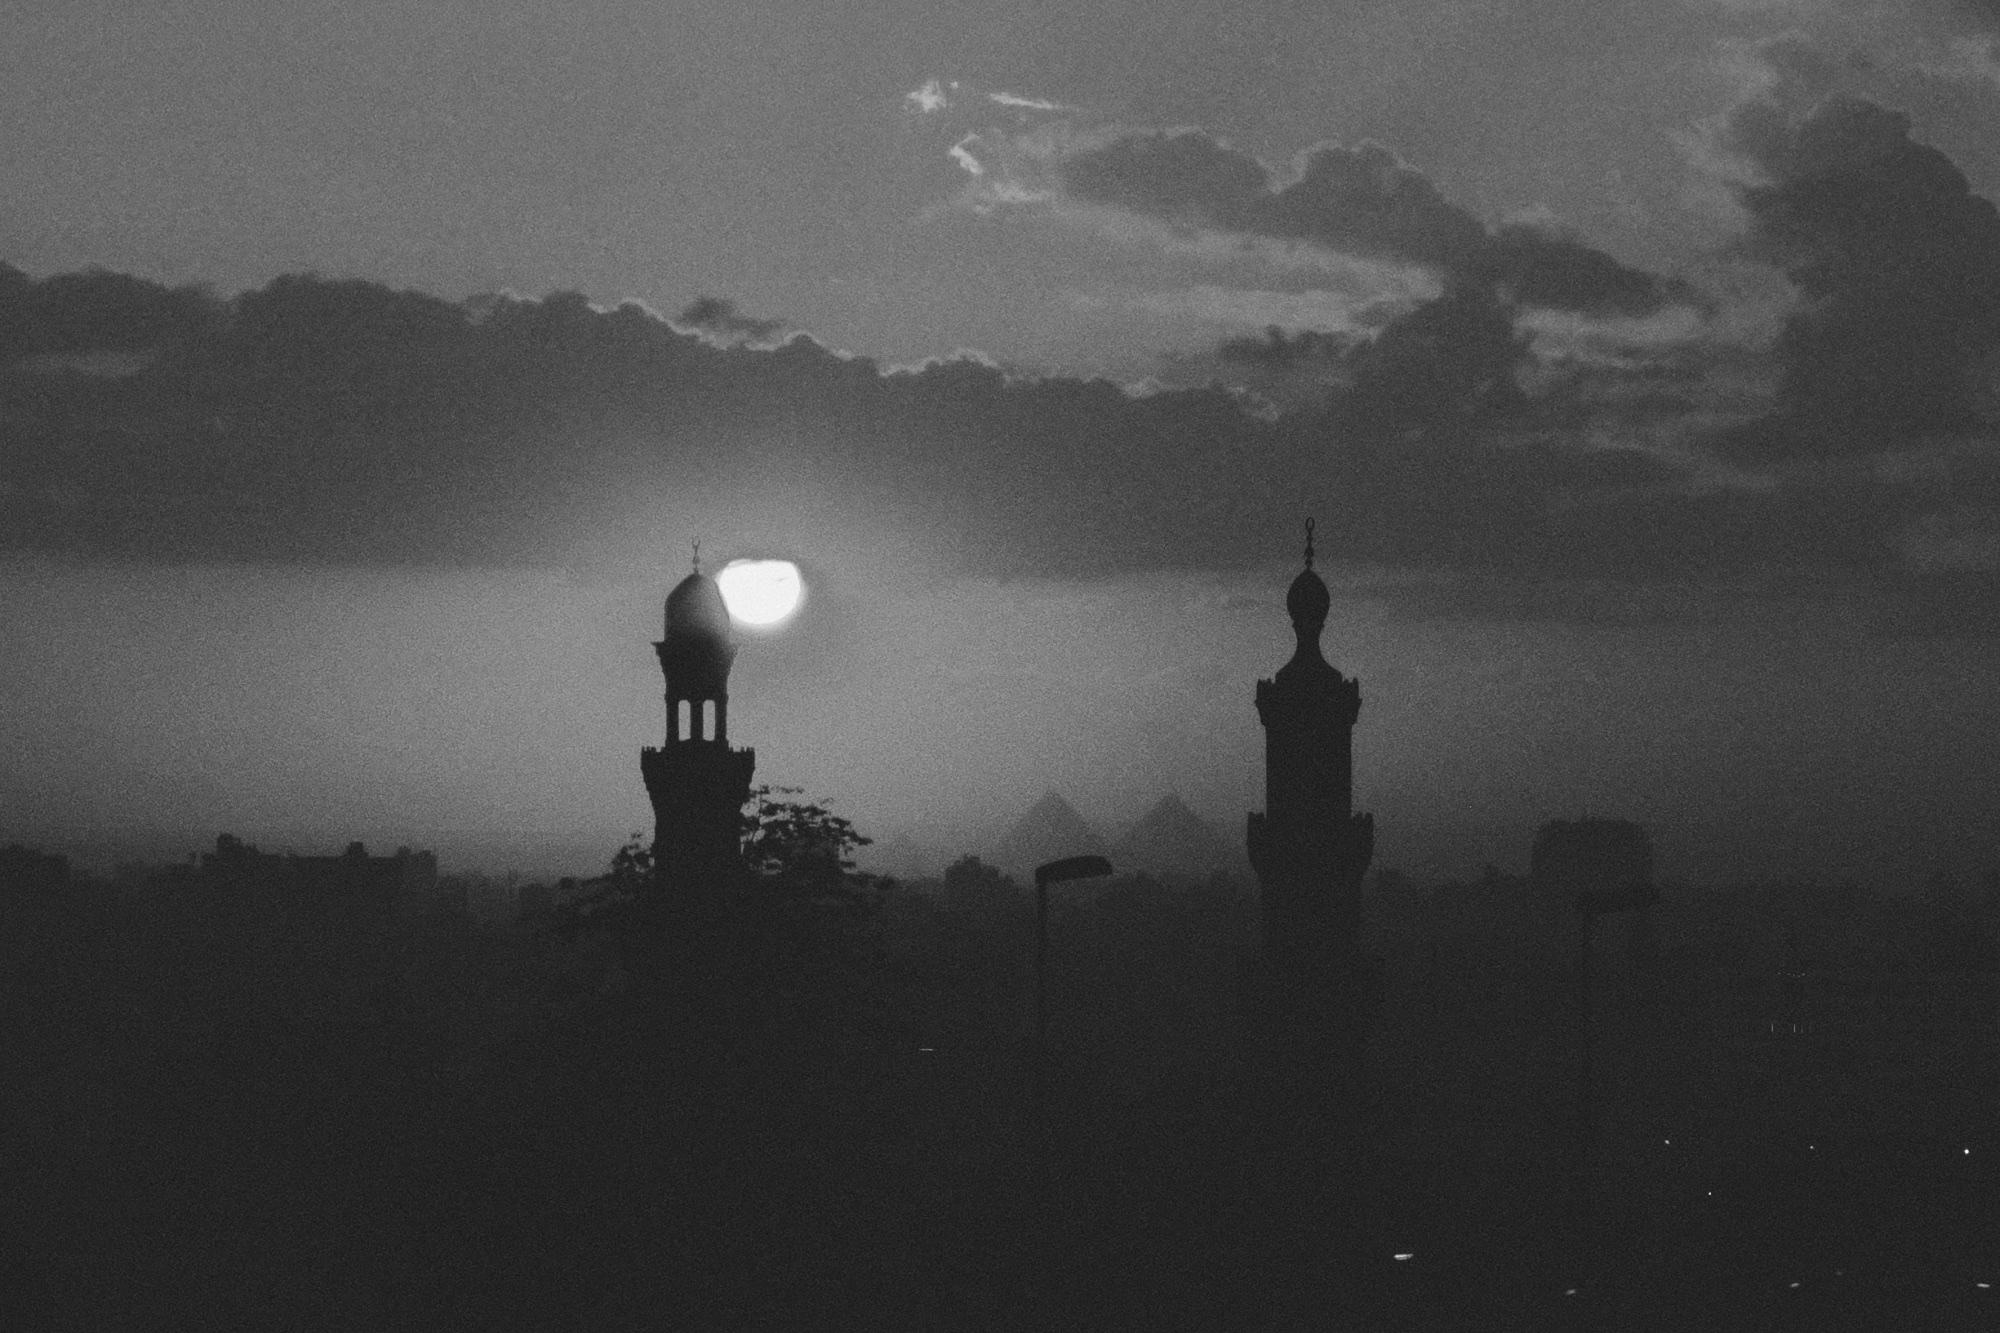 Pyramids and Minarets